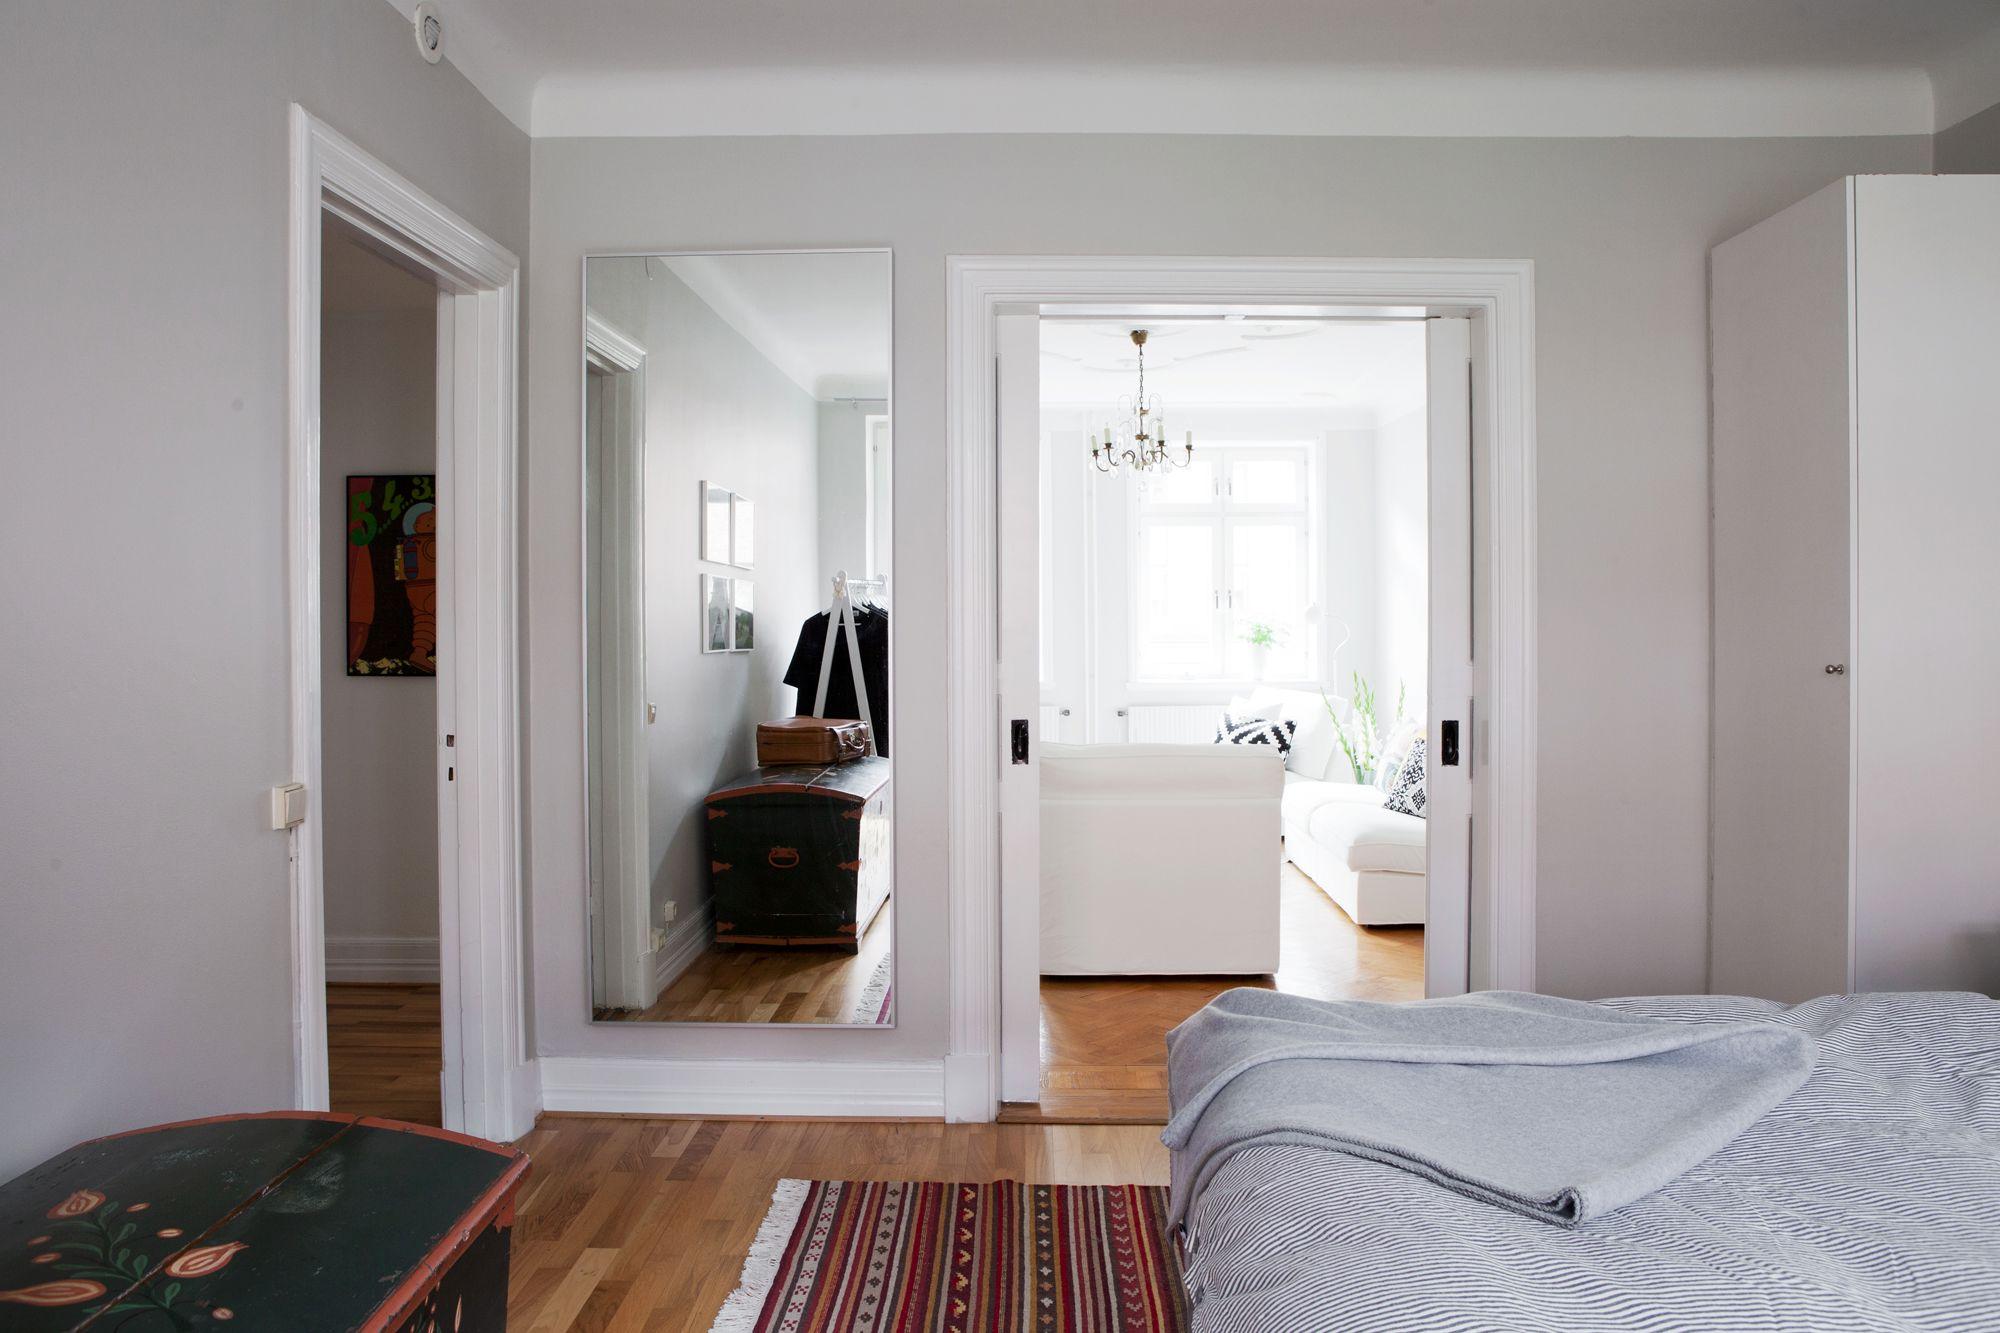 Paredes grises muebles blancos suelo de madera blog for D interiores